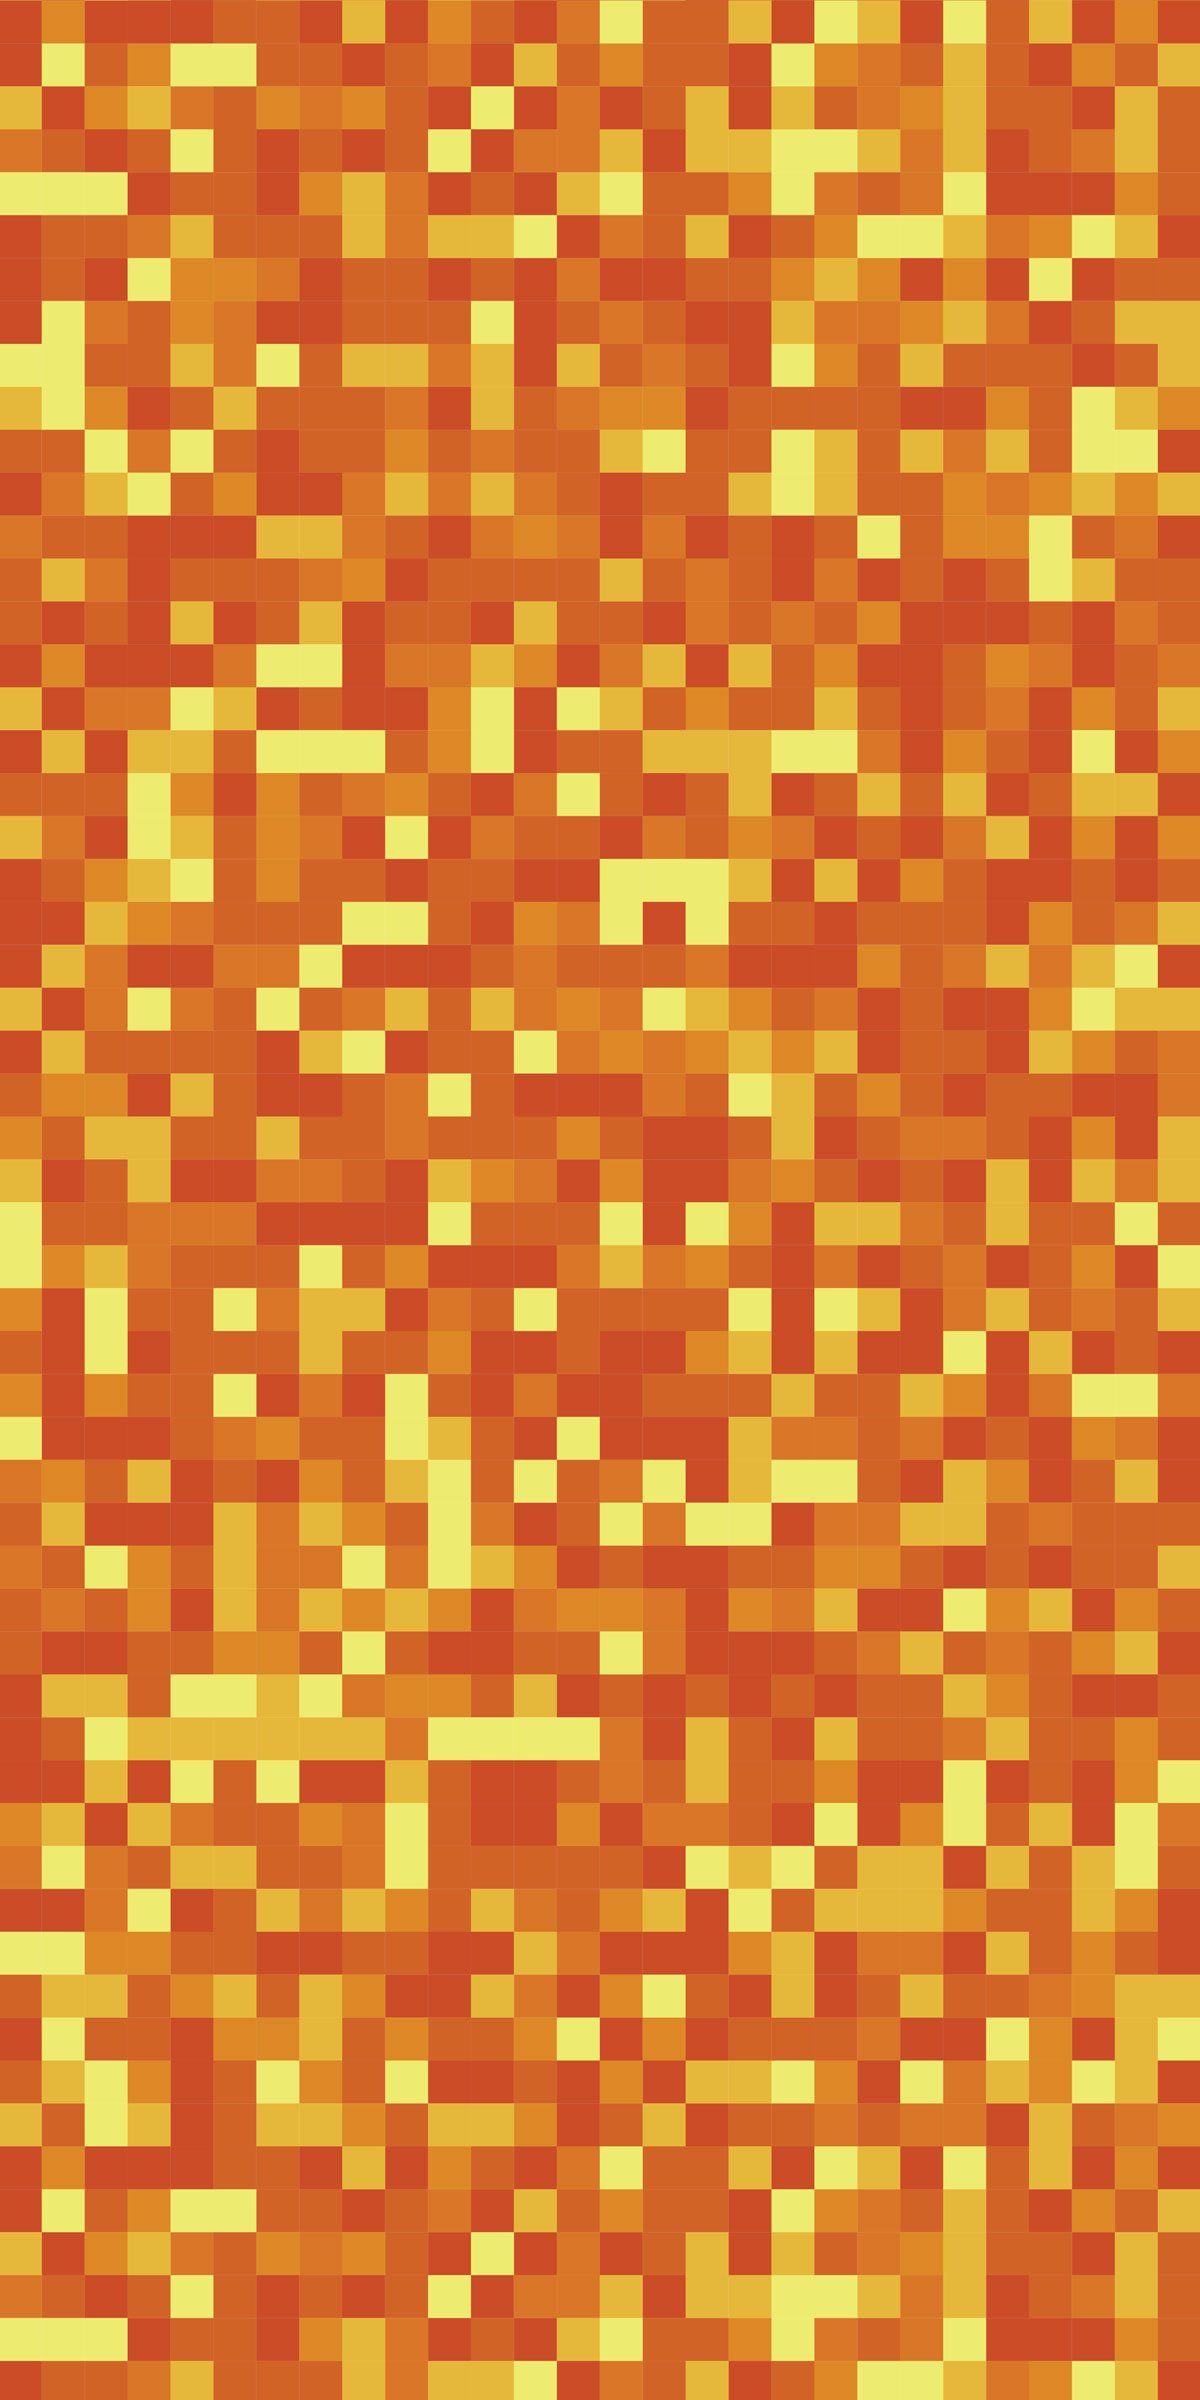 Custom Sized Orange Lava Pixel Mine Blocks Replacement Tarp  Canopy for Playset: Up to 70 Sq Ft Tarp Size by Monkey Bar Tarps LLC (Image #3)